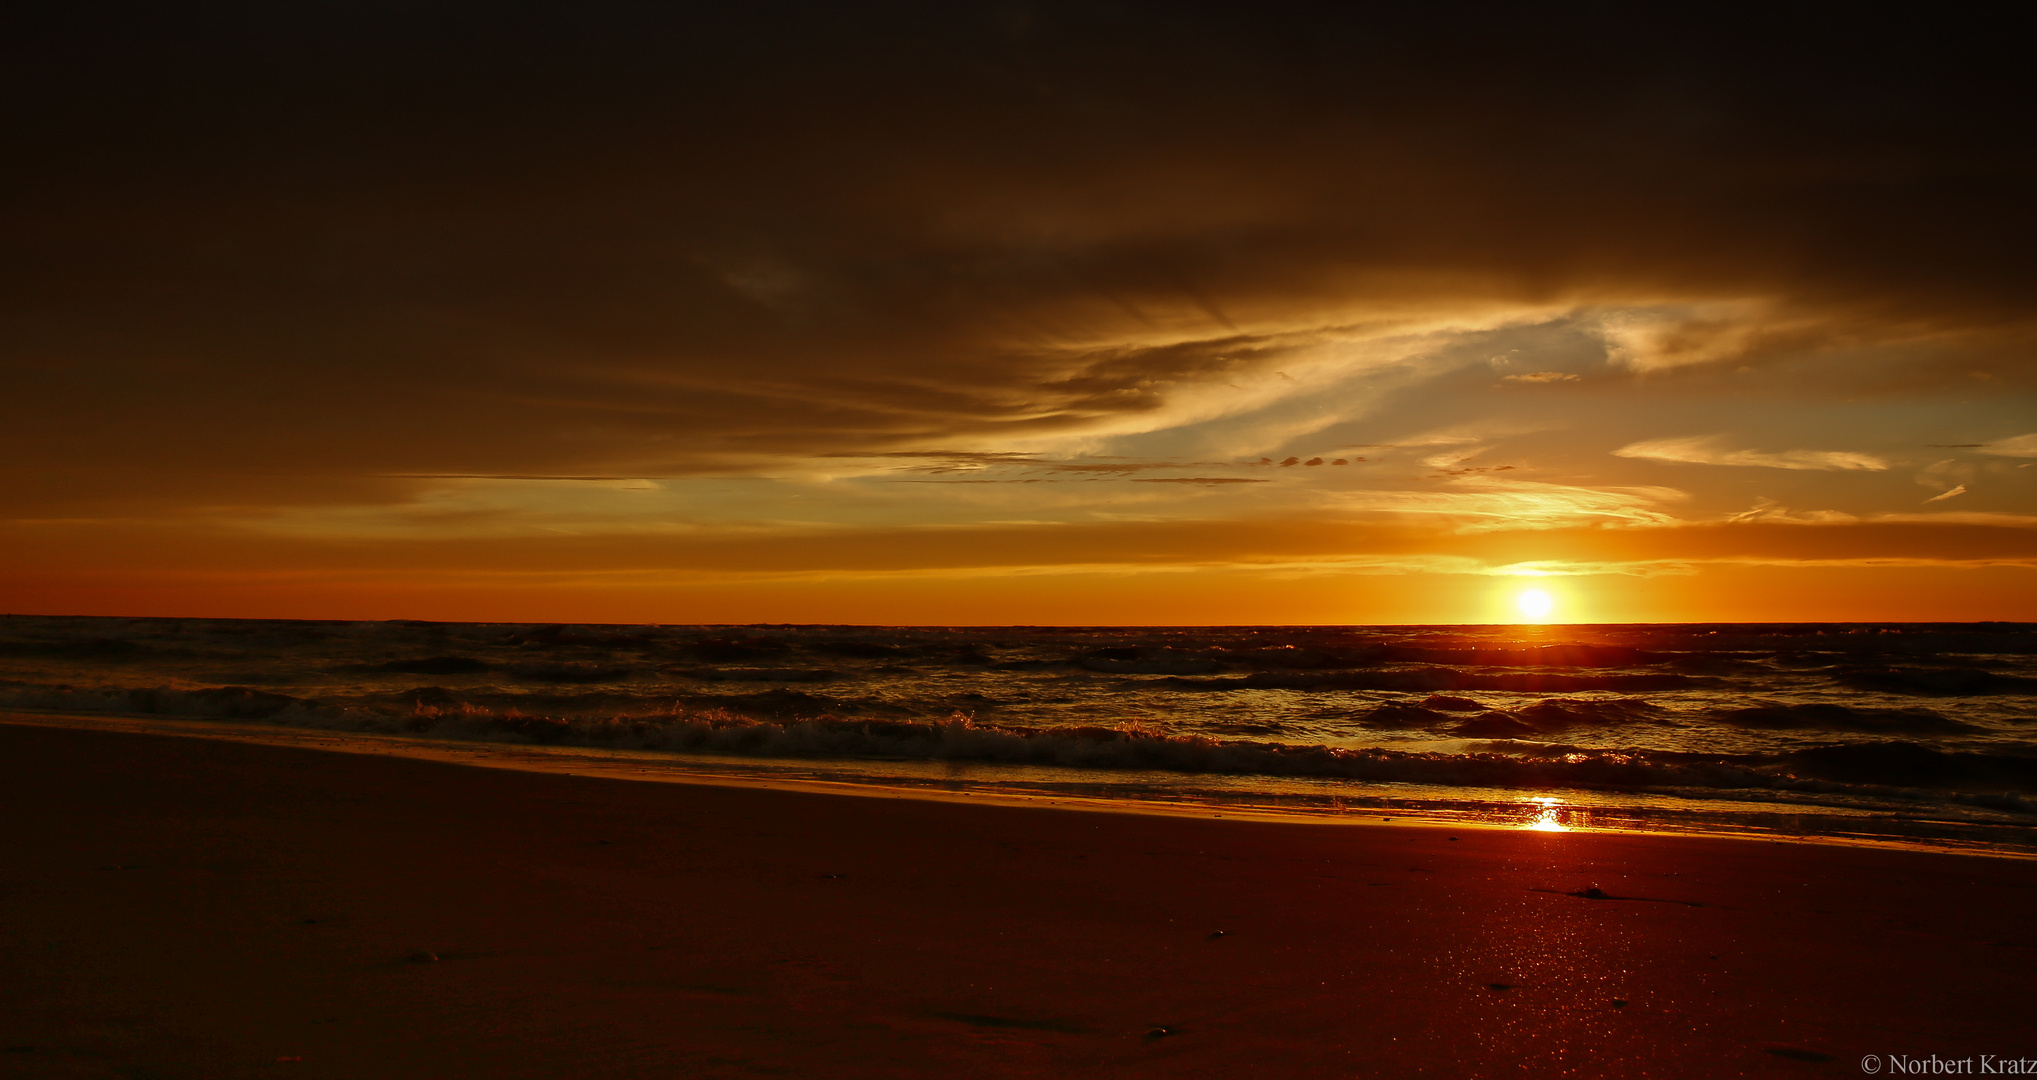 Sunset Zandvoort 07.09.2013